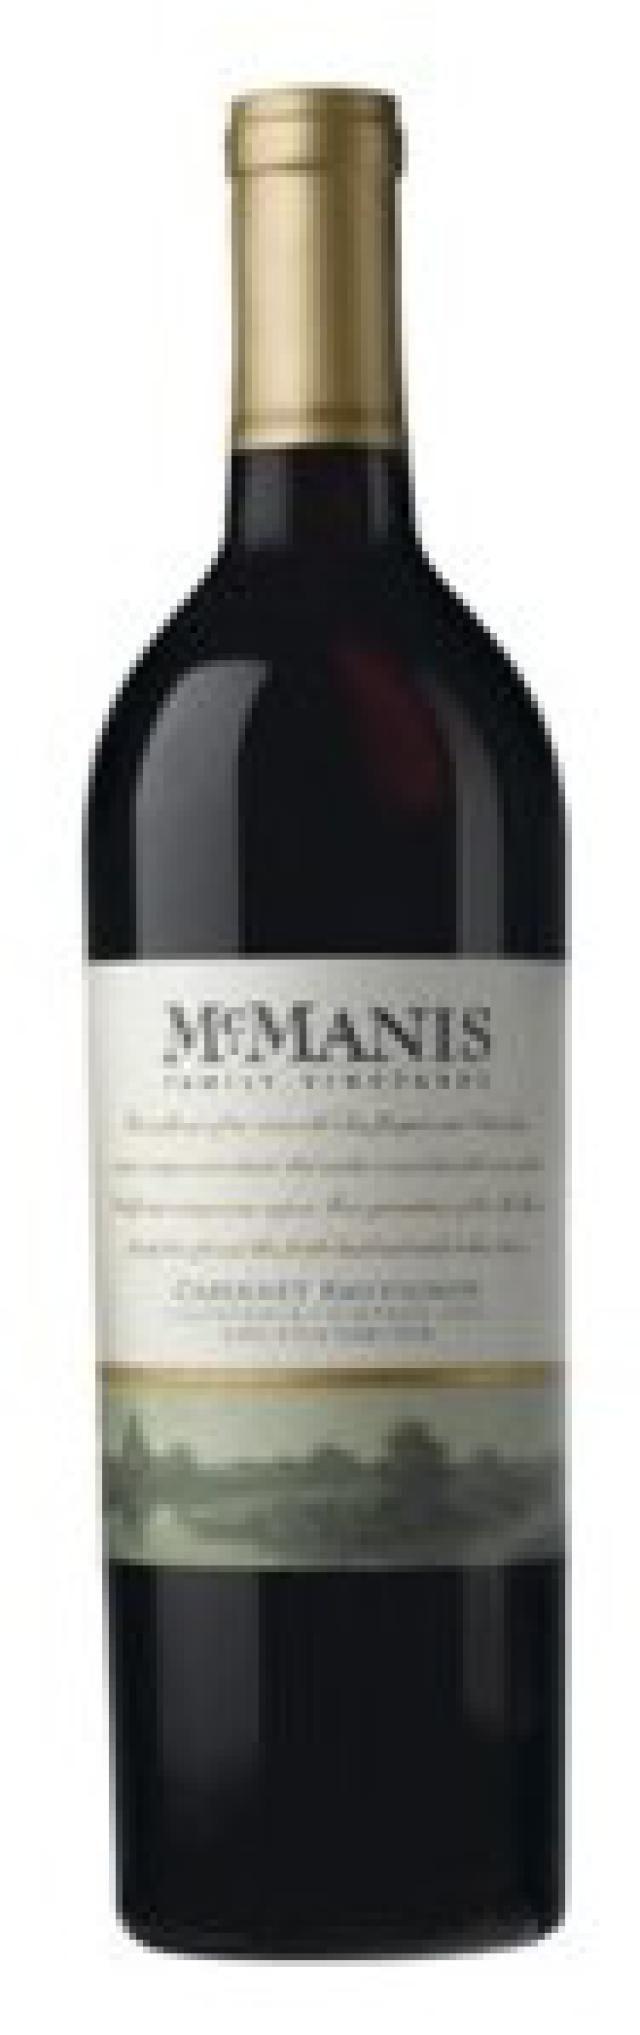 11 Great Cabernet Sauvignons for Under $10: McManis Family Vineyards Cabernet Sauvignon (California) $10